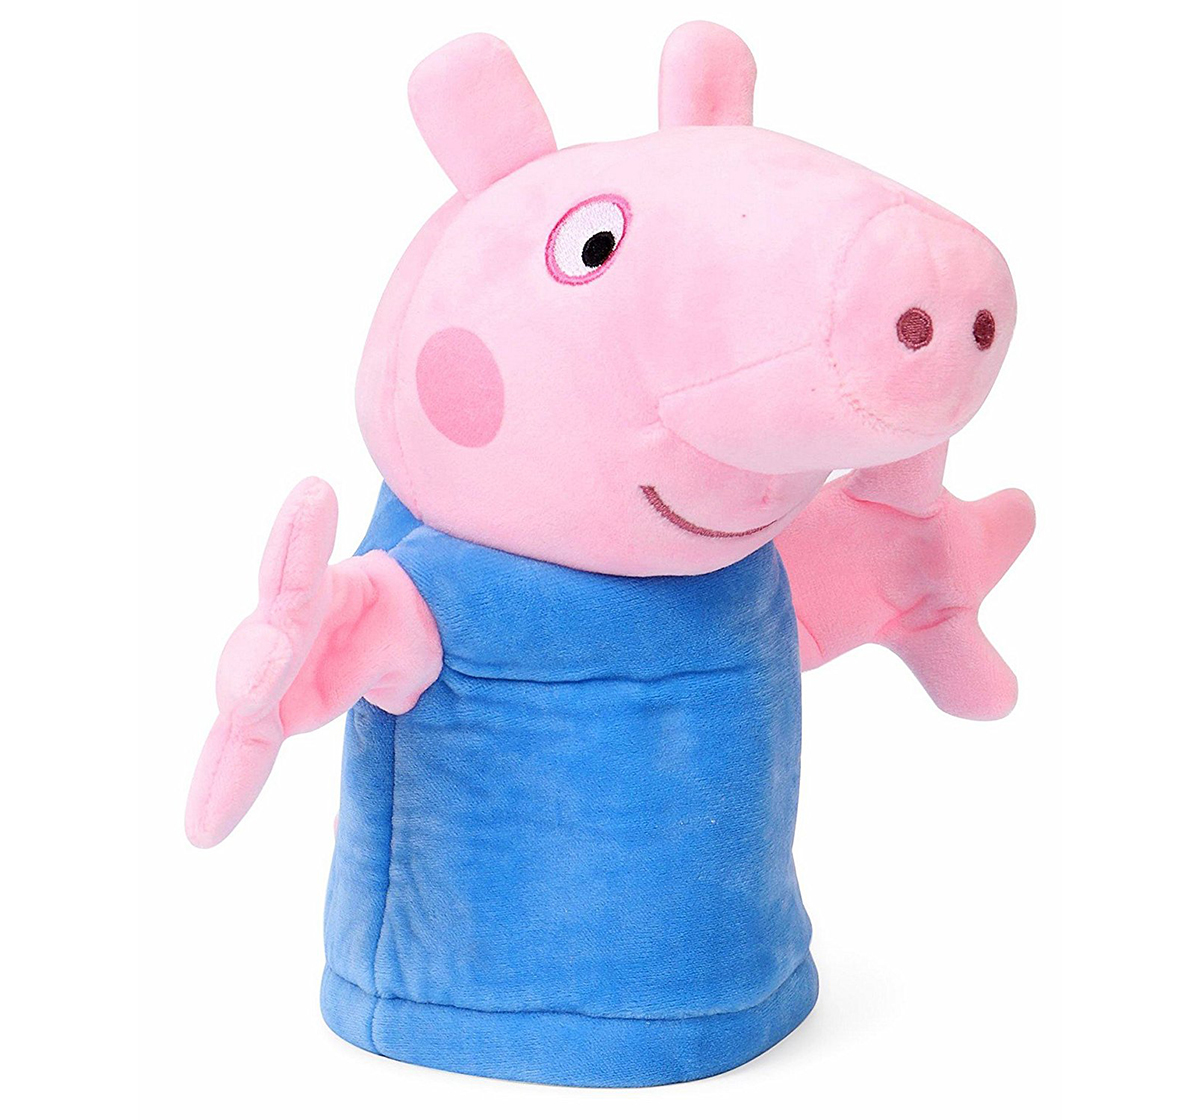 Peppa Pig | Peppa Pig George 26 Cm Soft Toy for Kids age 3Y+ (Blue)